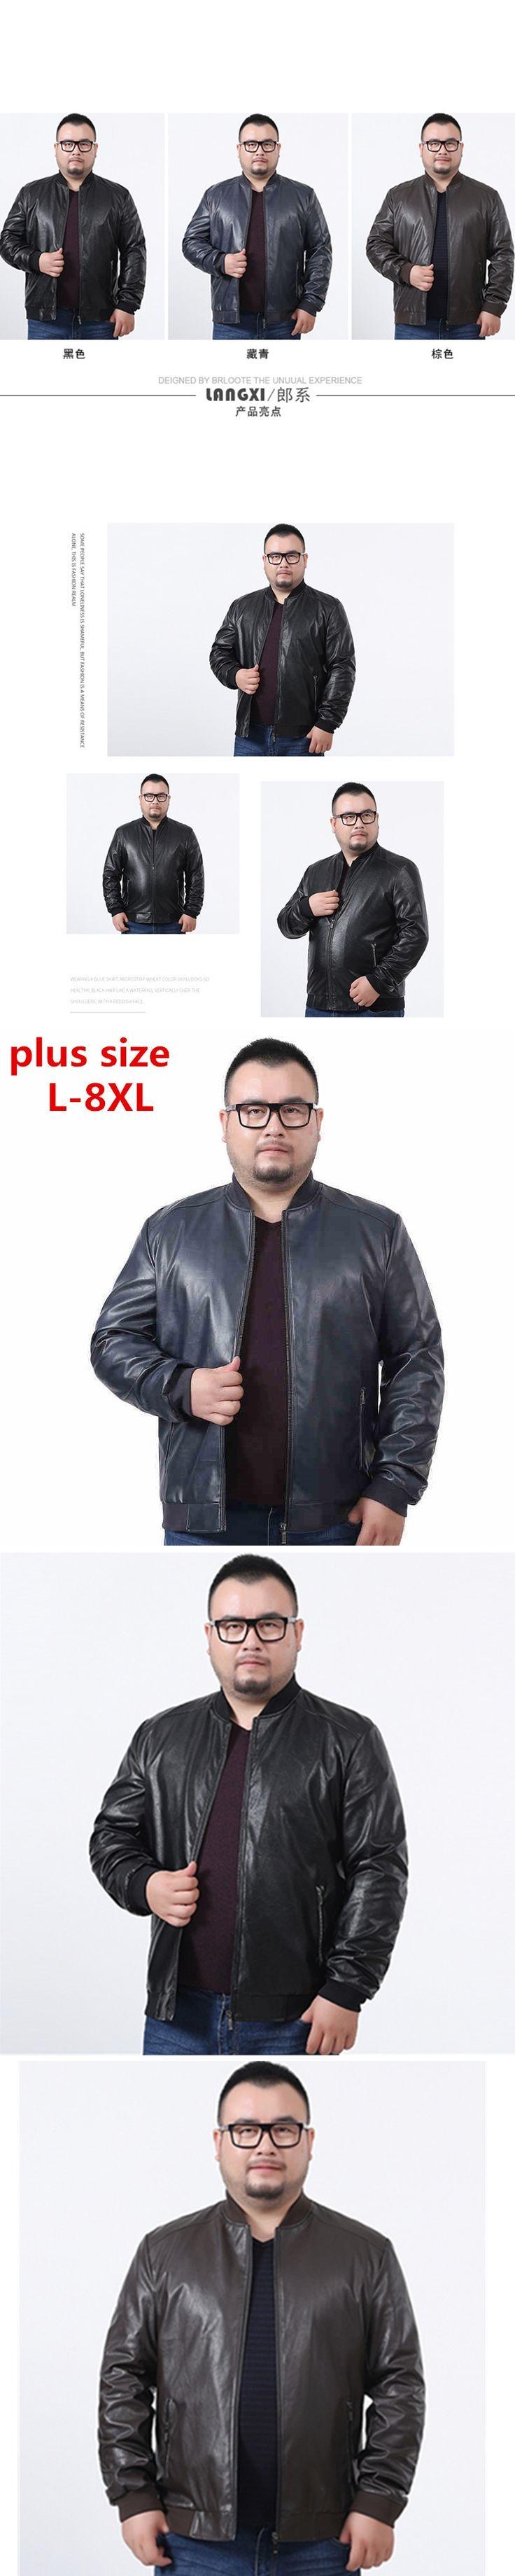 plus size 8XL  7XL 6XL 5XL Spring Men's Leather Jackets Brand Real Sheepskin Jaqueta De Couro Black Male Leather Jacket For Men